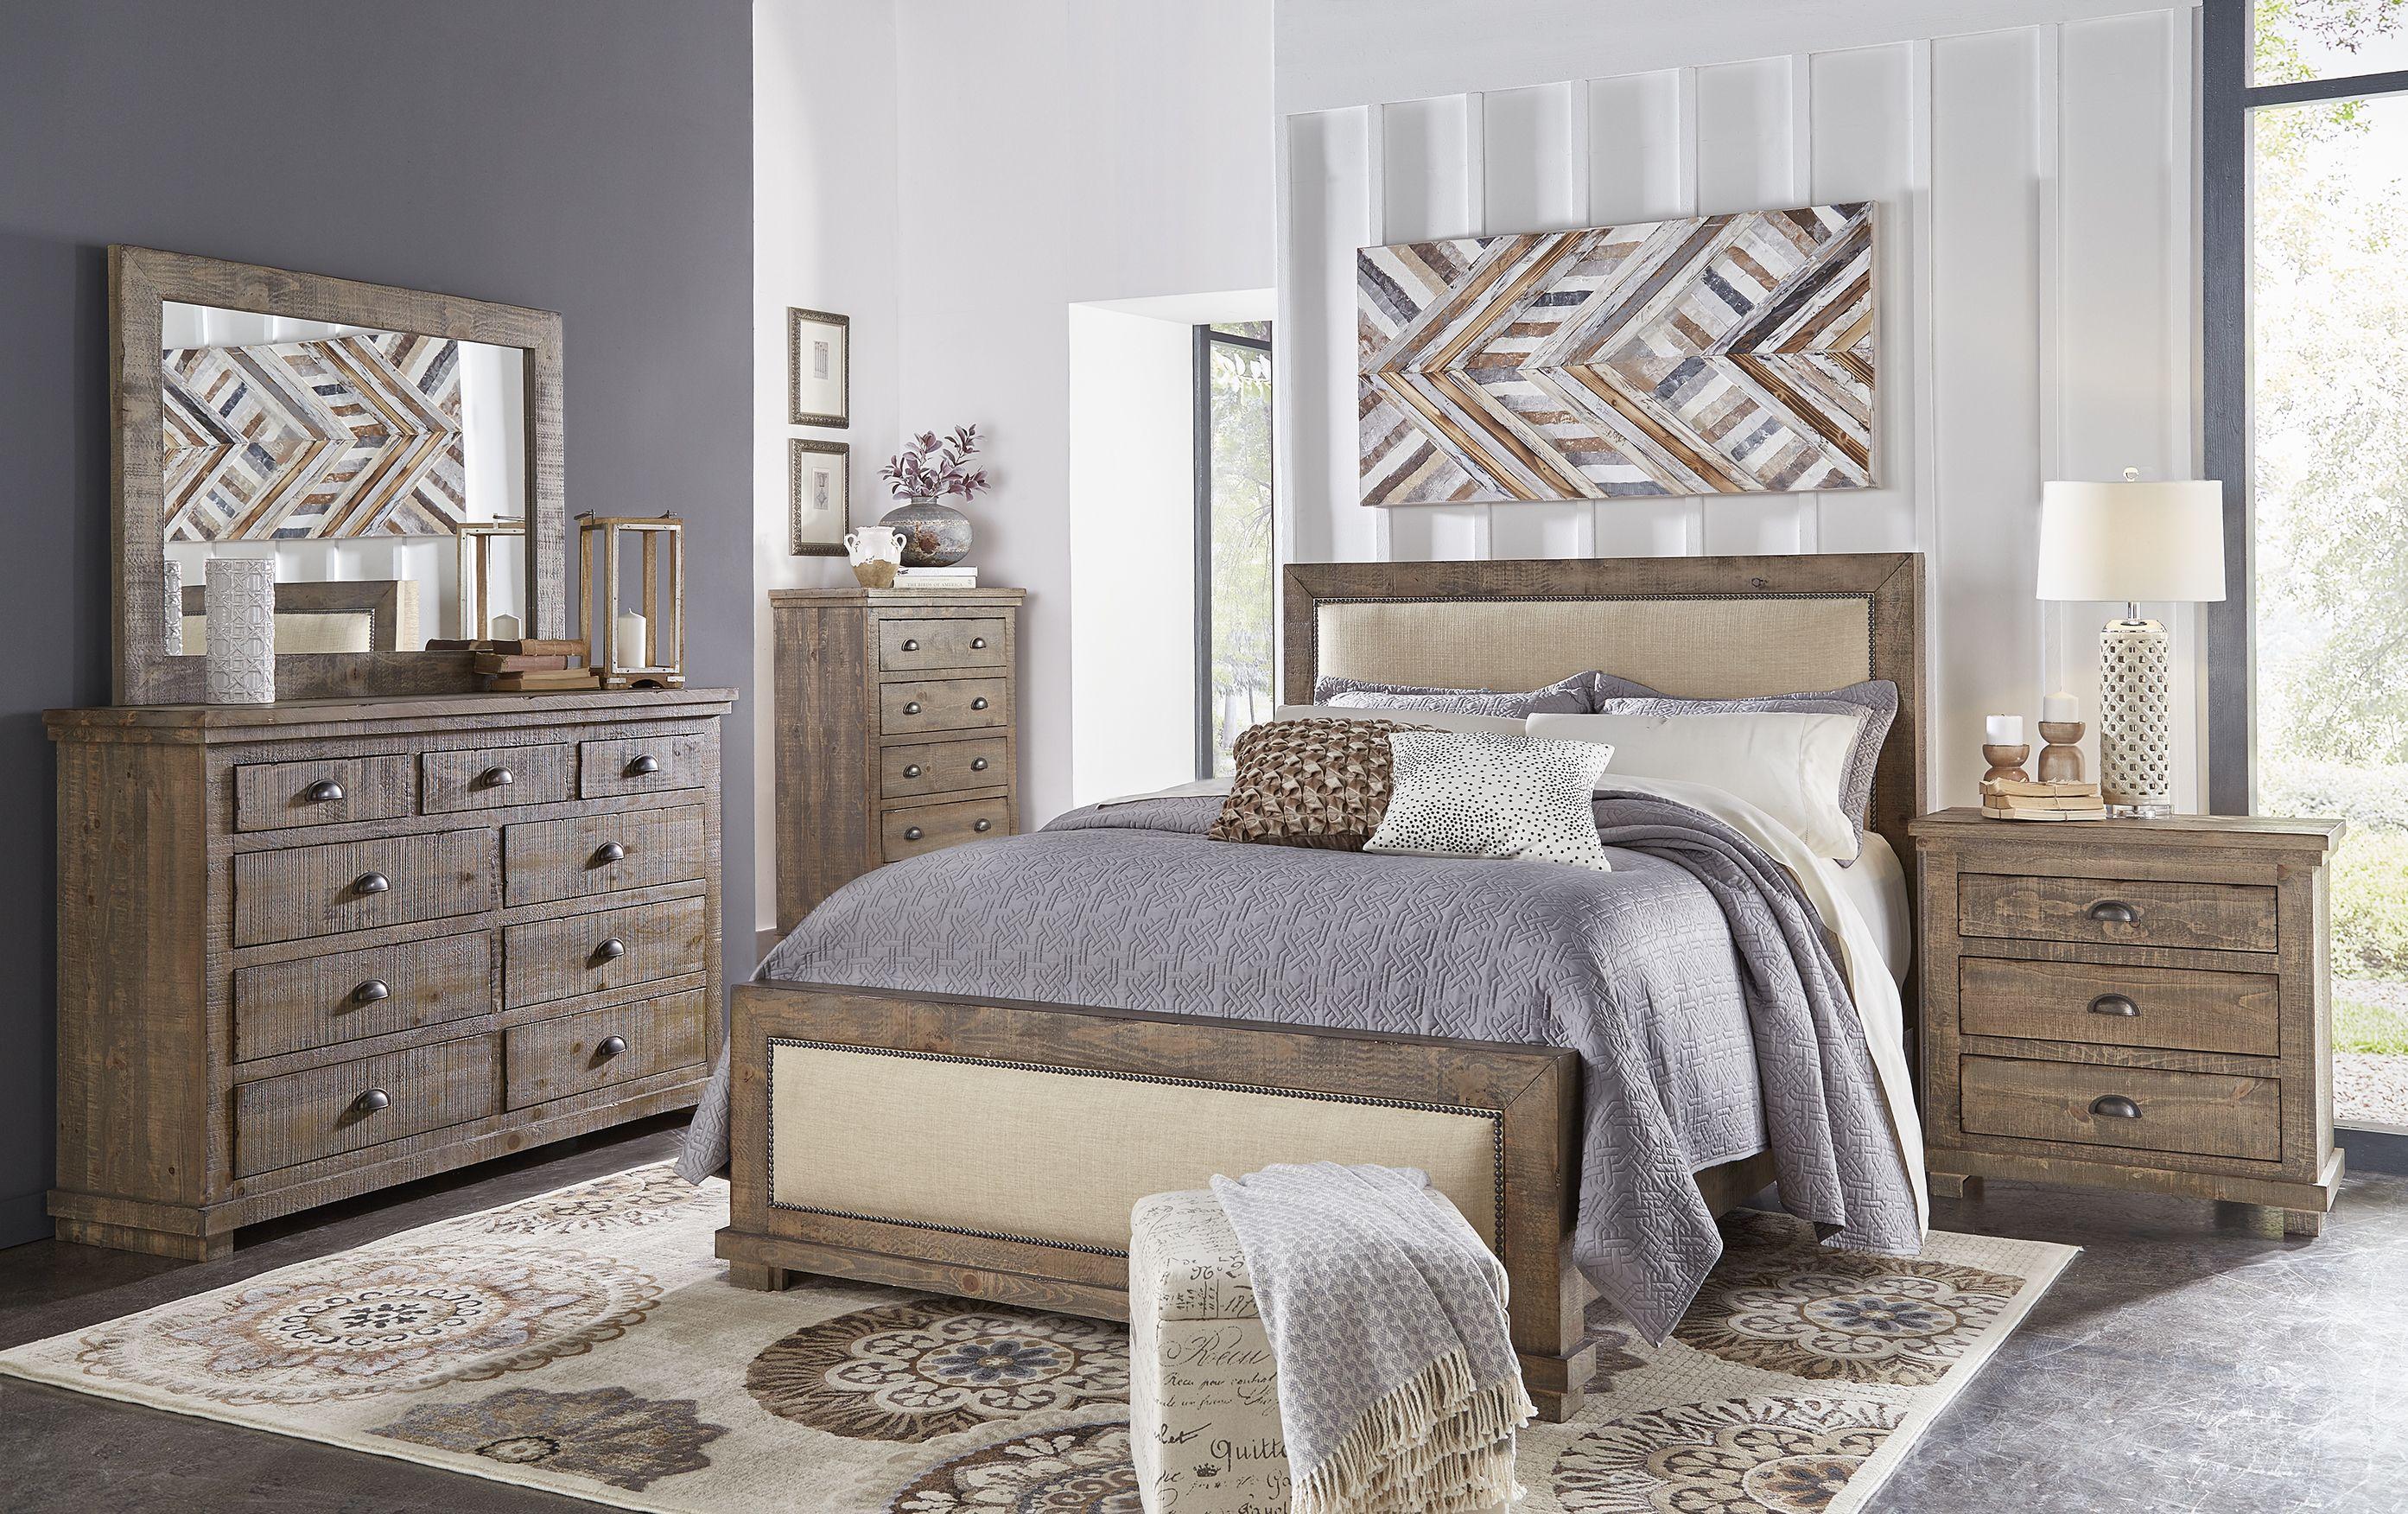 P635 Willow Upholstered Headboard Upholstered bedroom